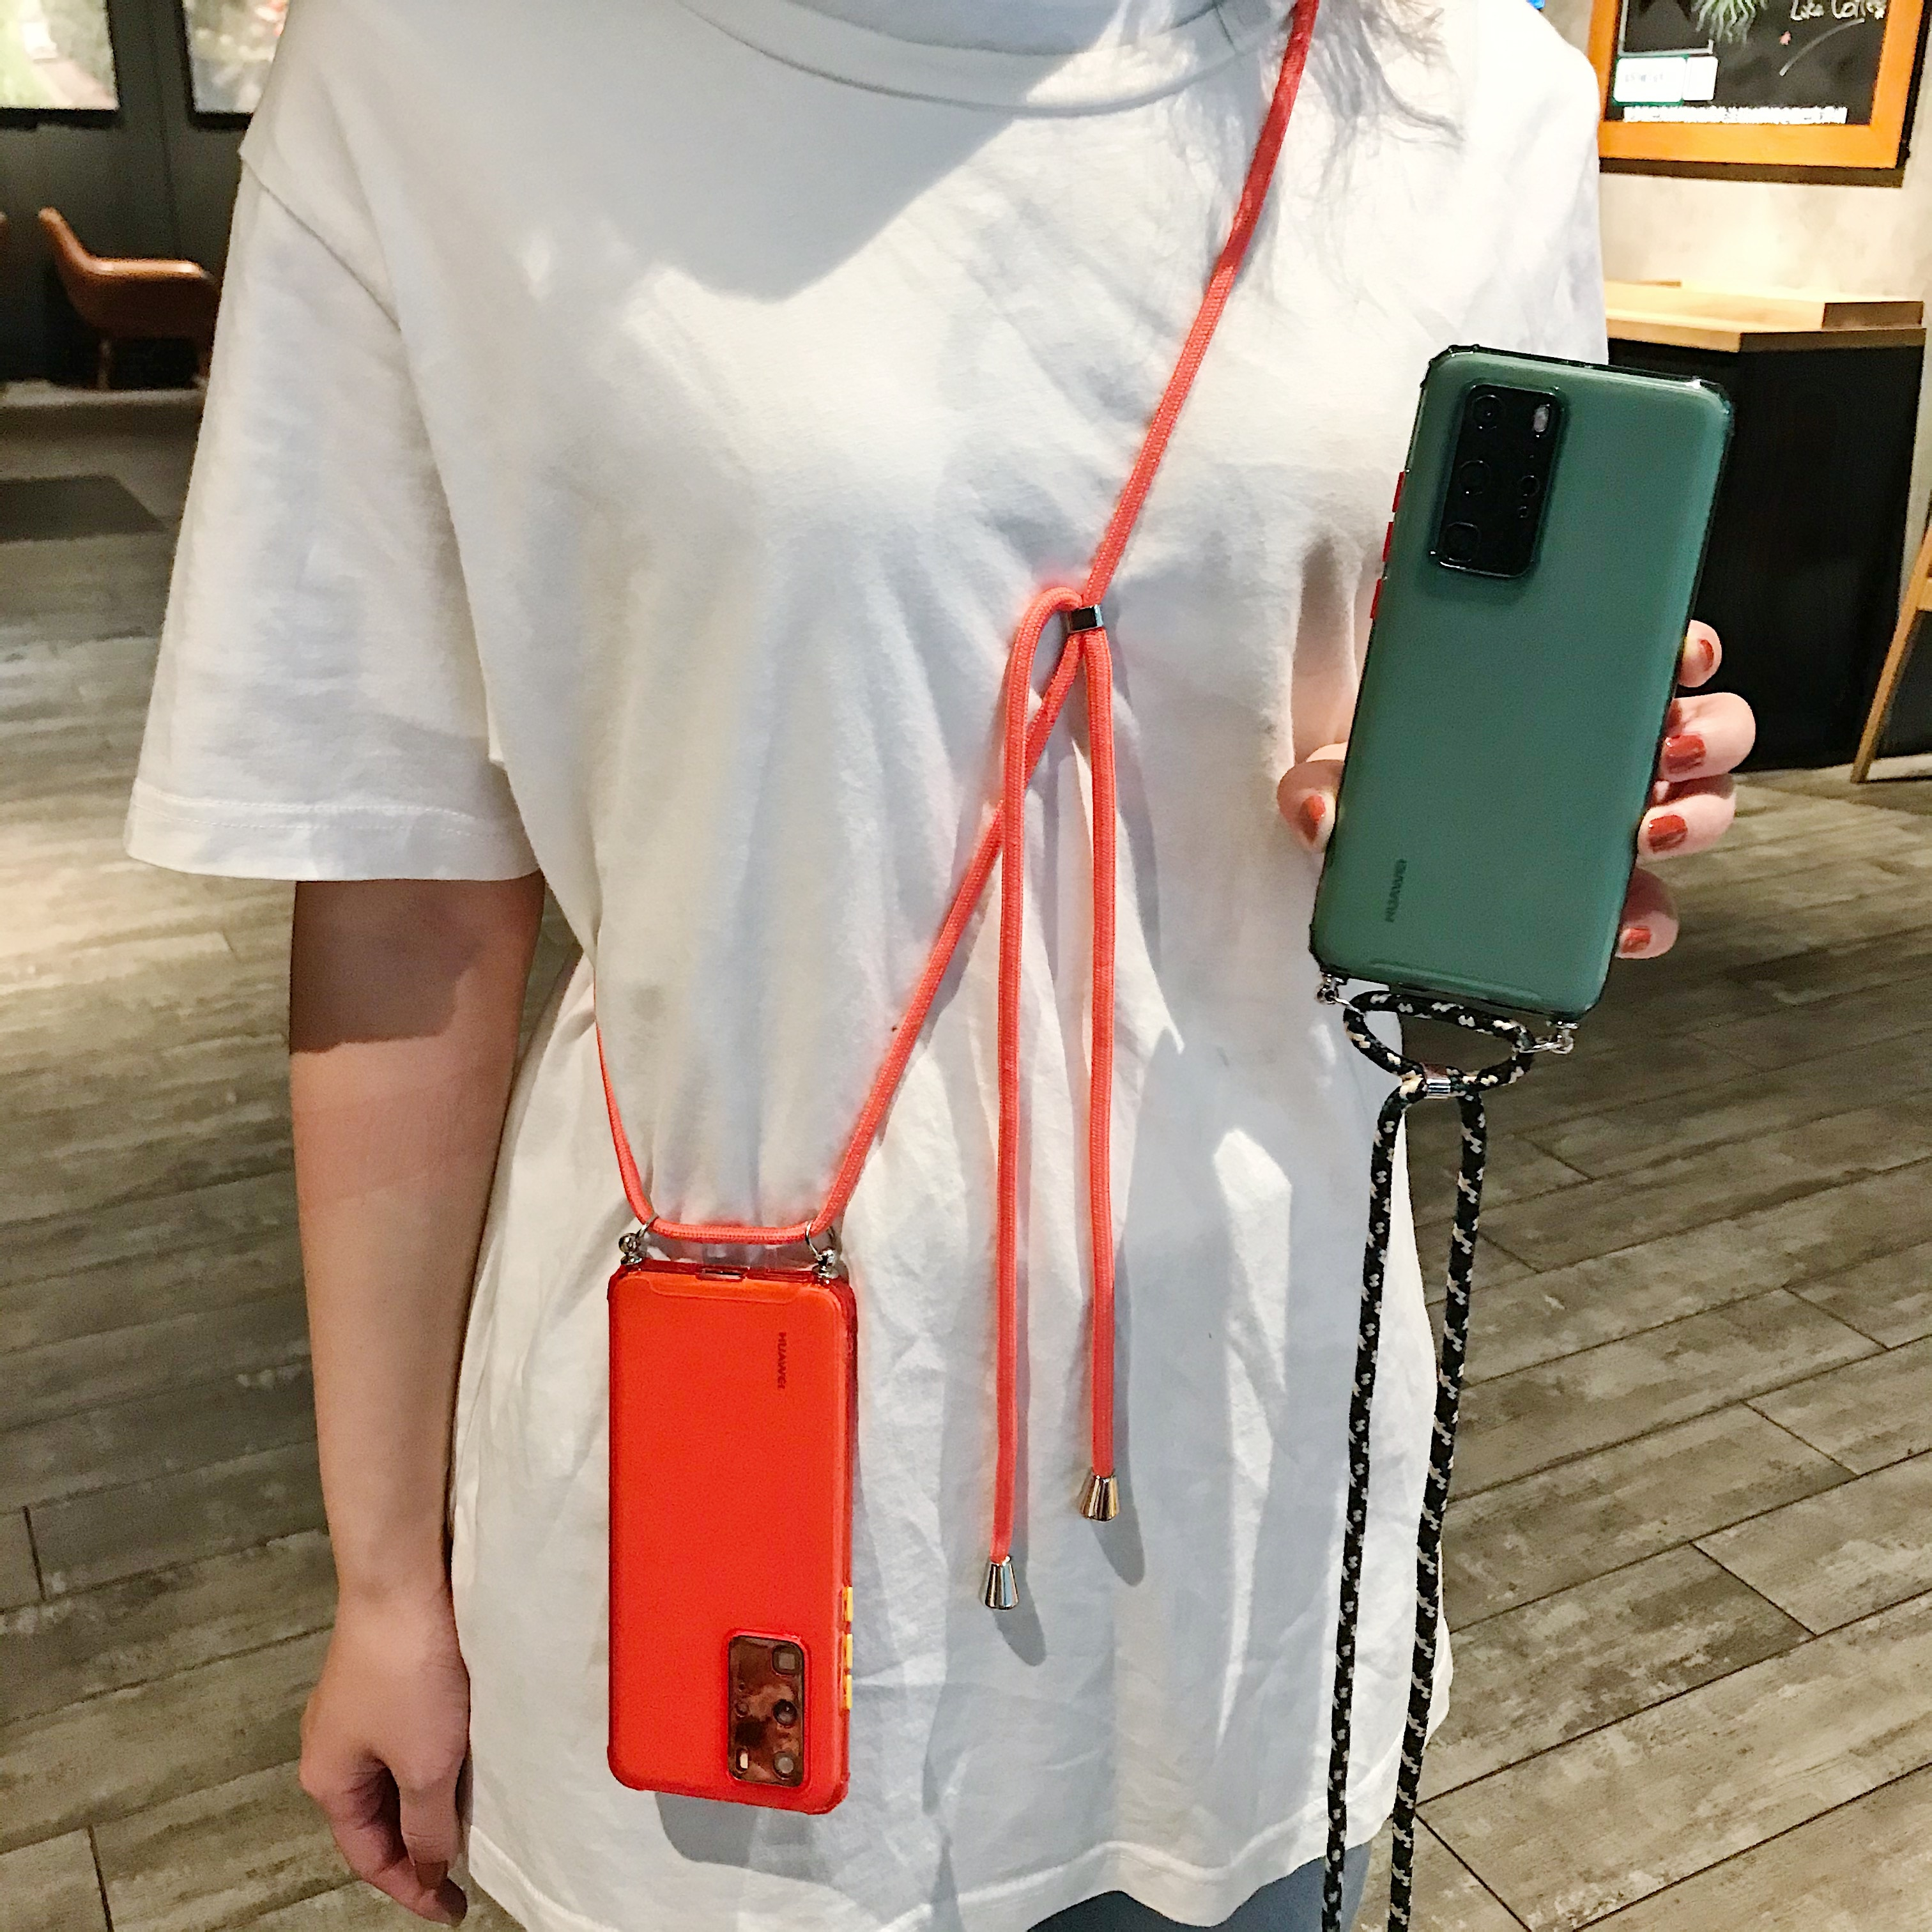 Crossbody Halskette Lanyard Fall Für Huawei P20 P30 Pro P40 Lite E Mate 20 30 Y7P Honor 10 Lite 20 pro 9C Y6 Y7 Y9 P Smart 2019